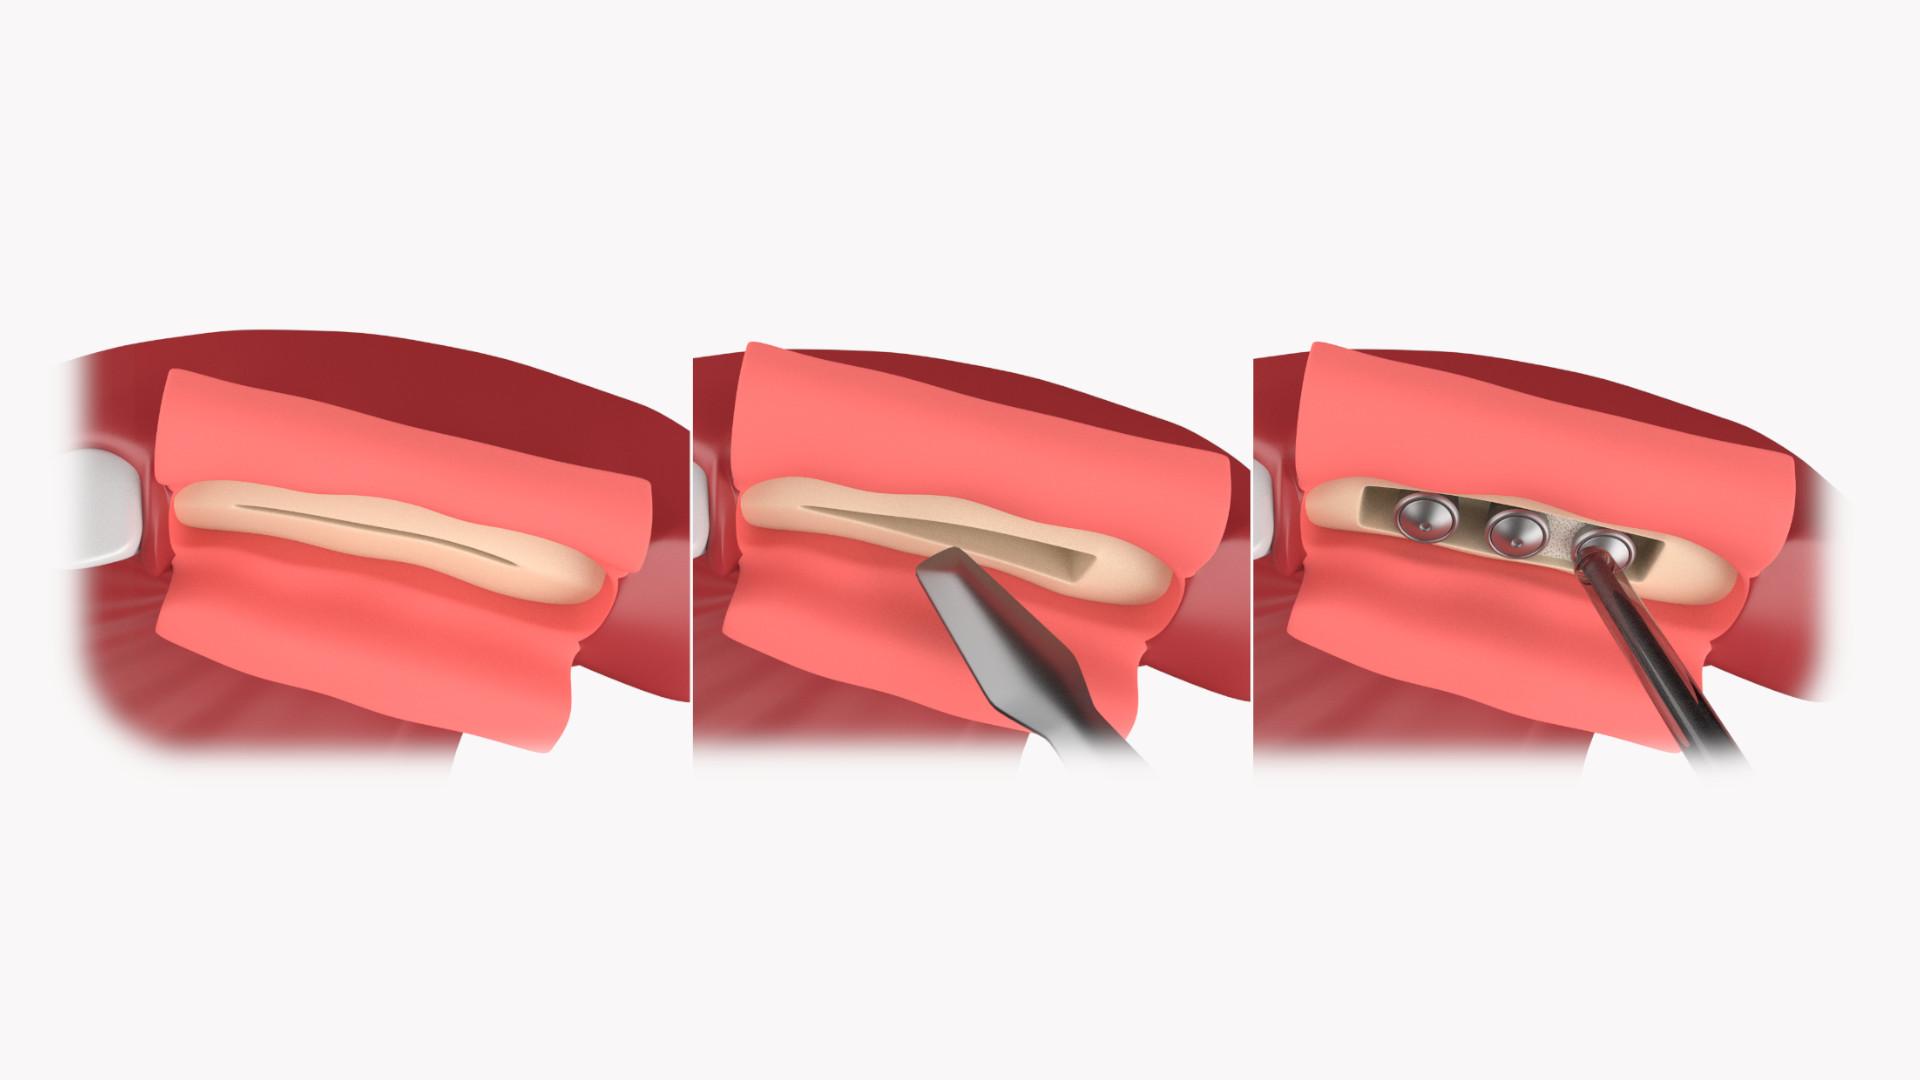 Knochenaufbau (Bone-Splitting)